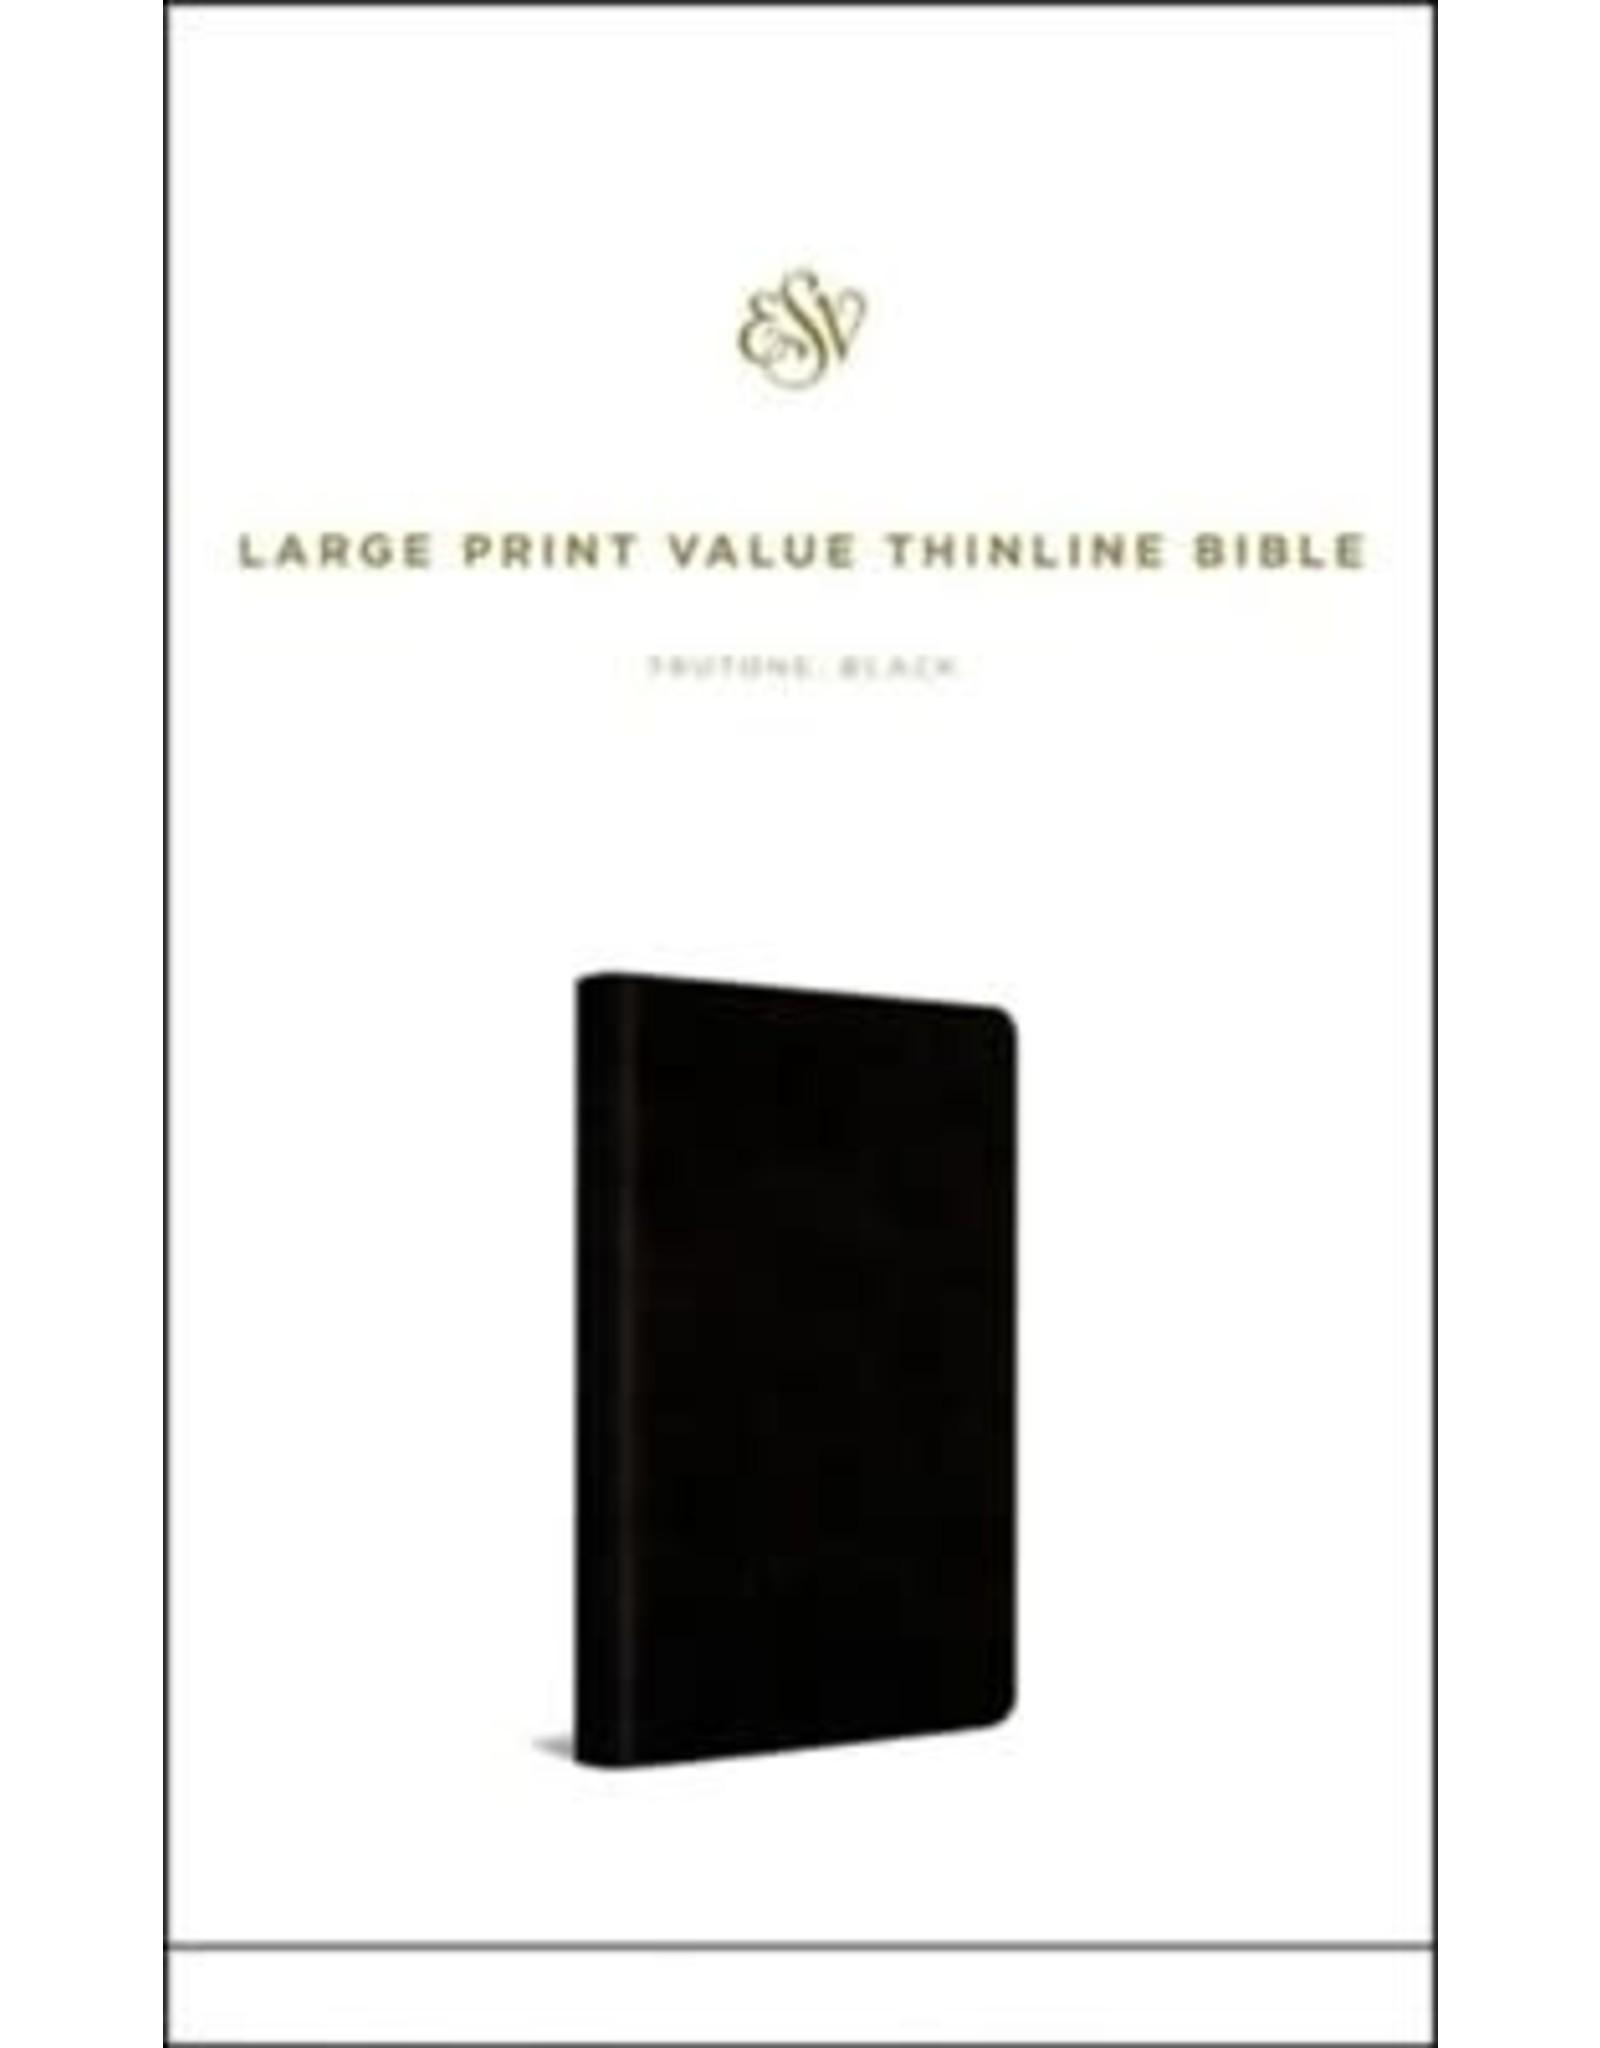 ESV Large Print Value Thinline Bible, Black